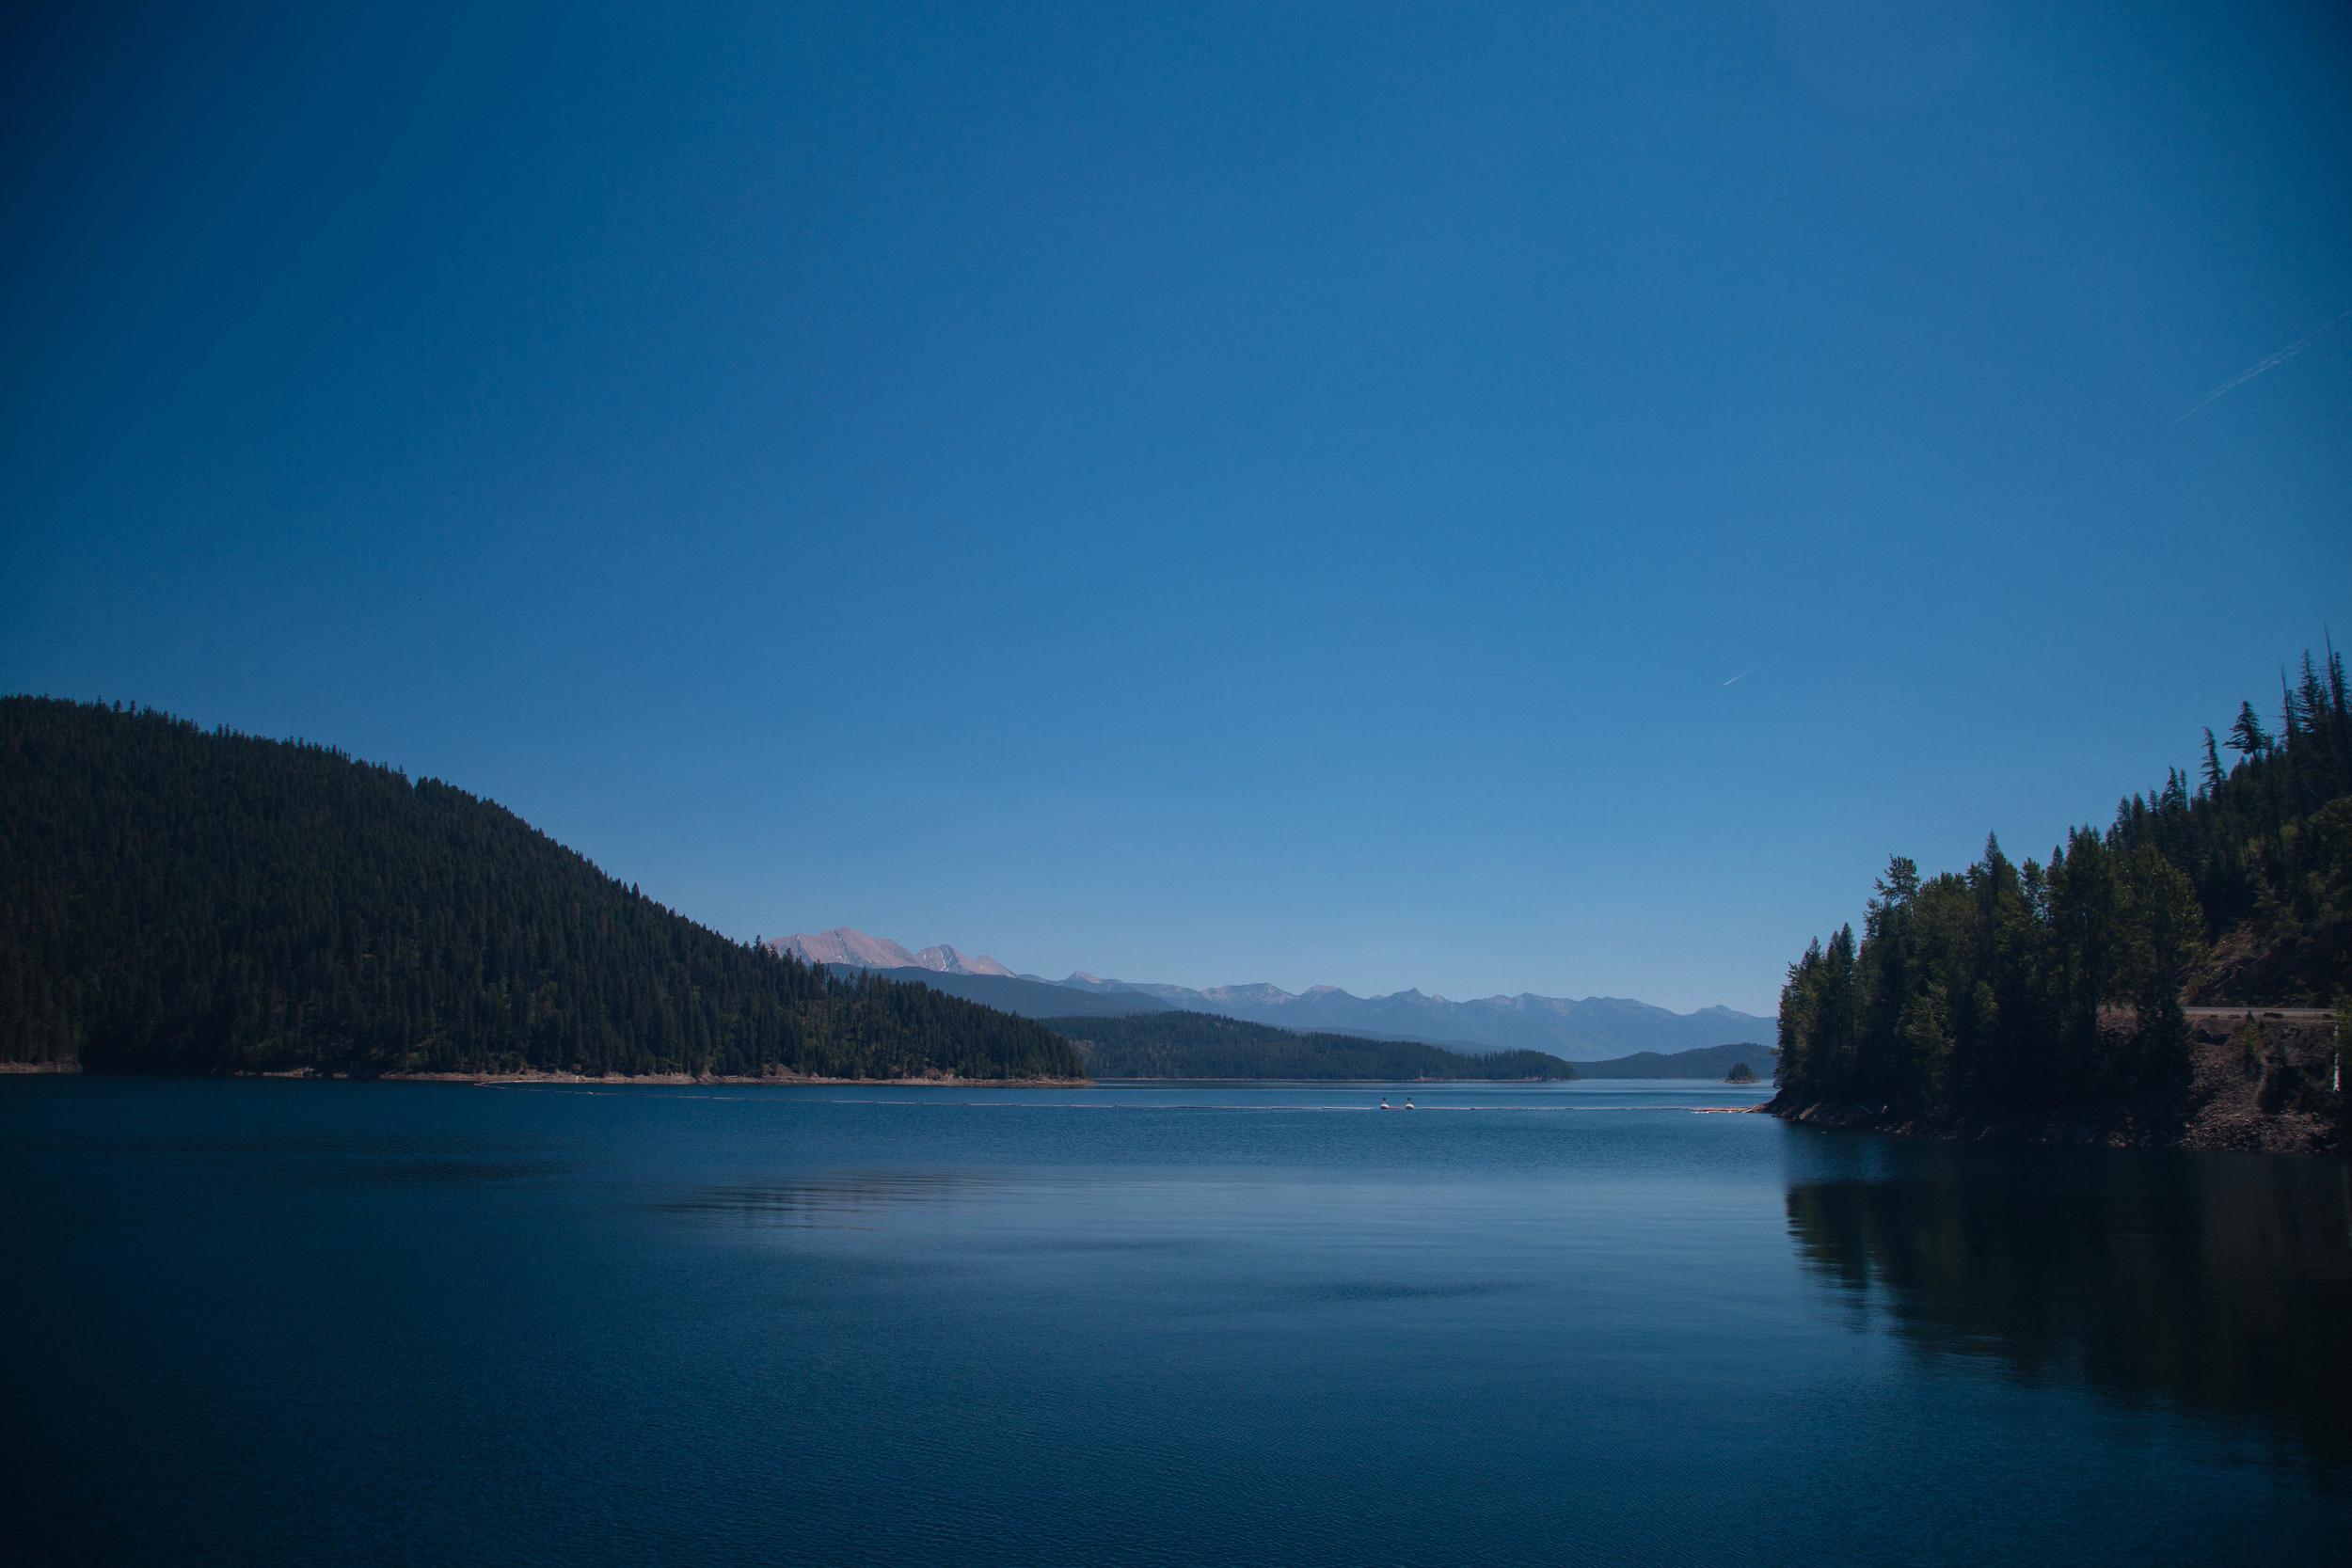 20150627-WestMontana-1513-3.jpg